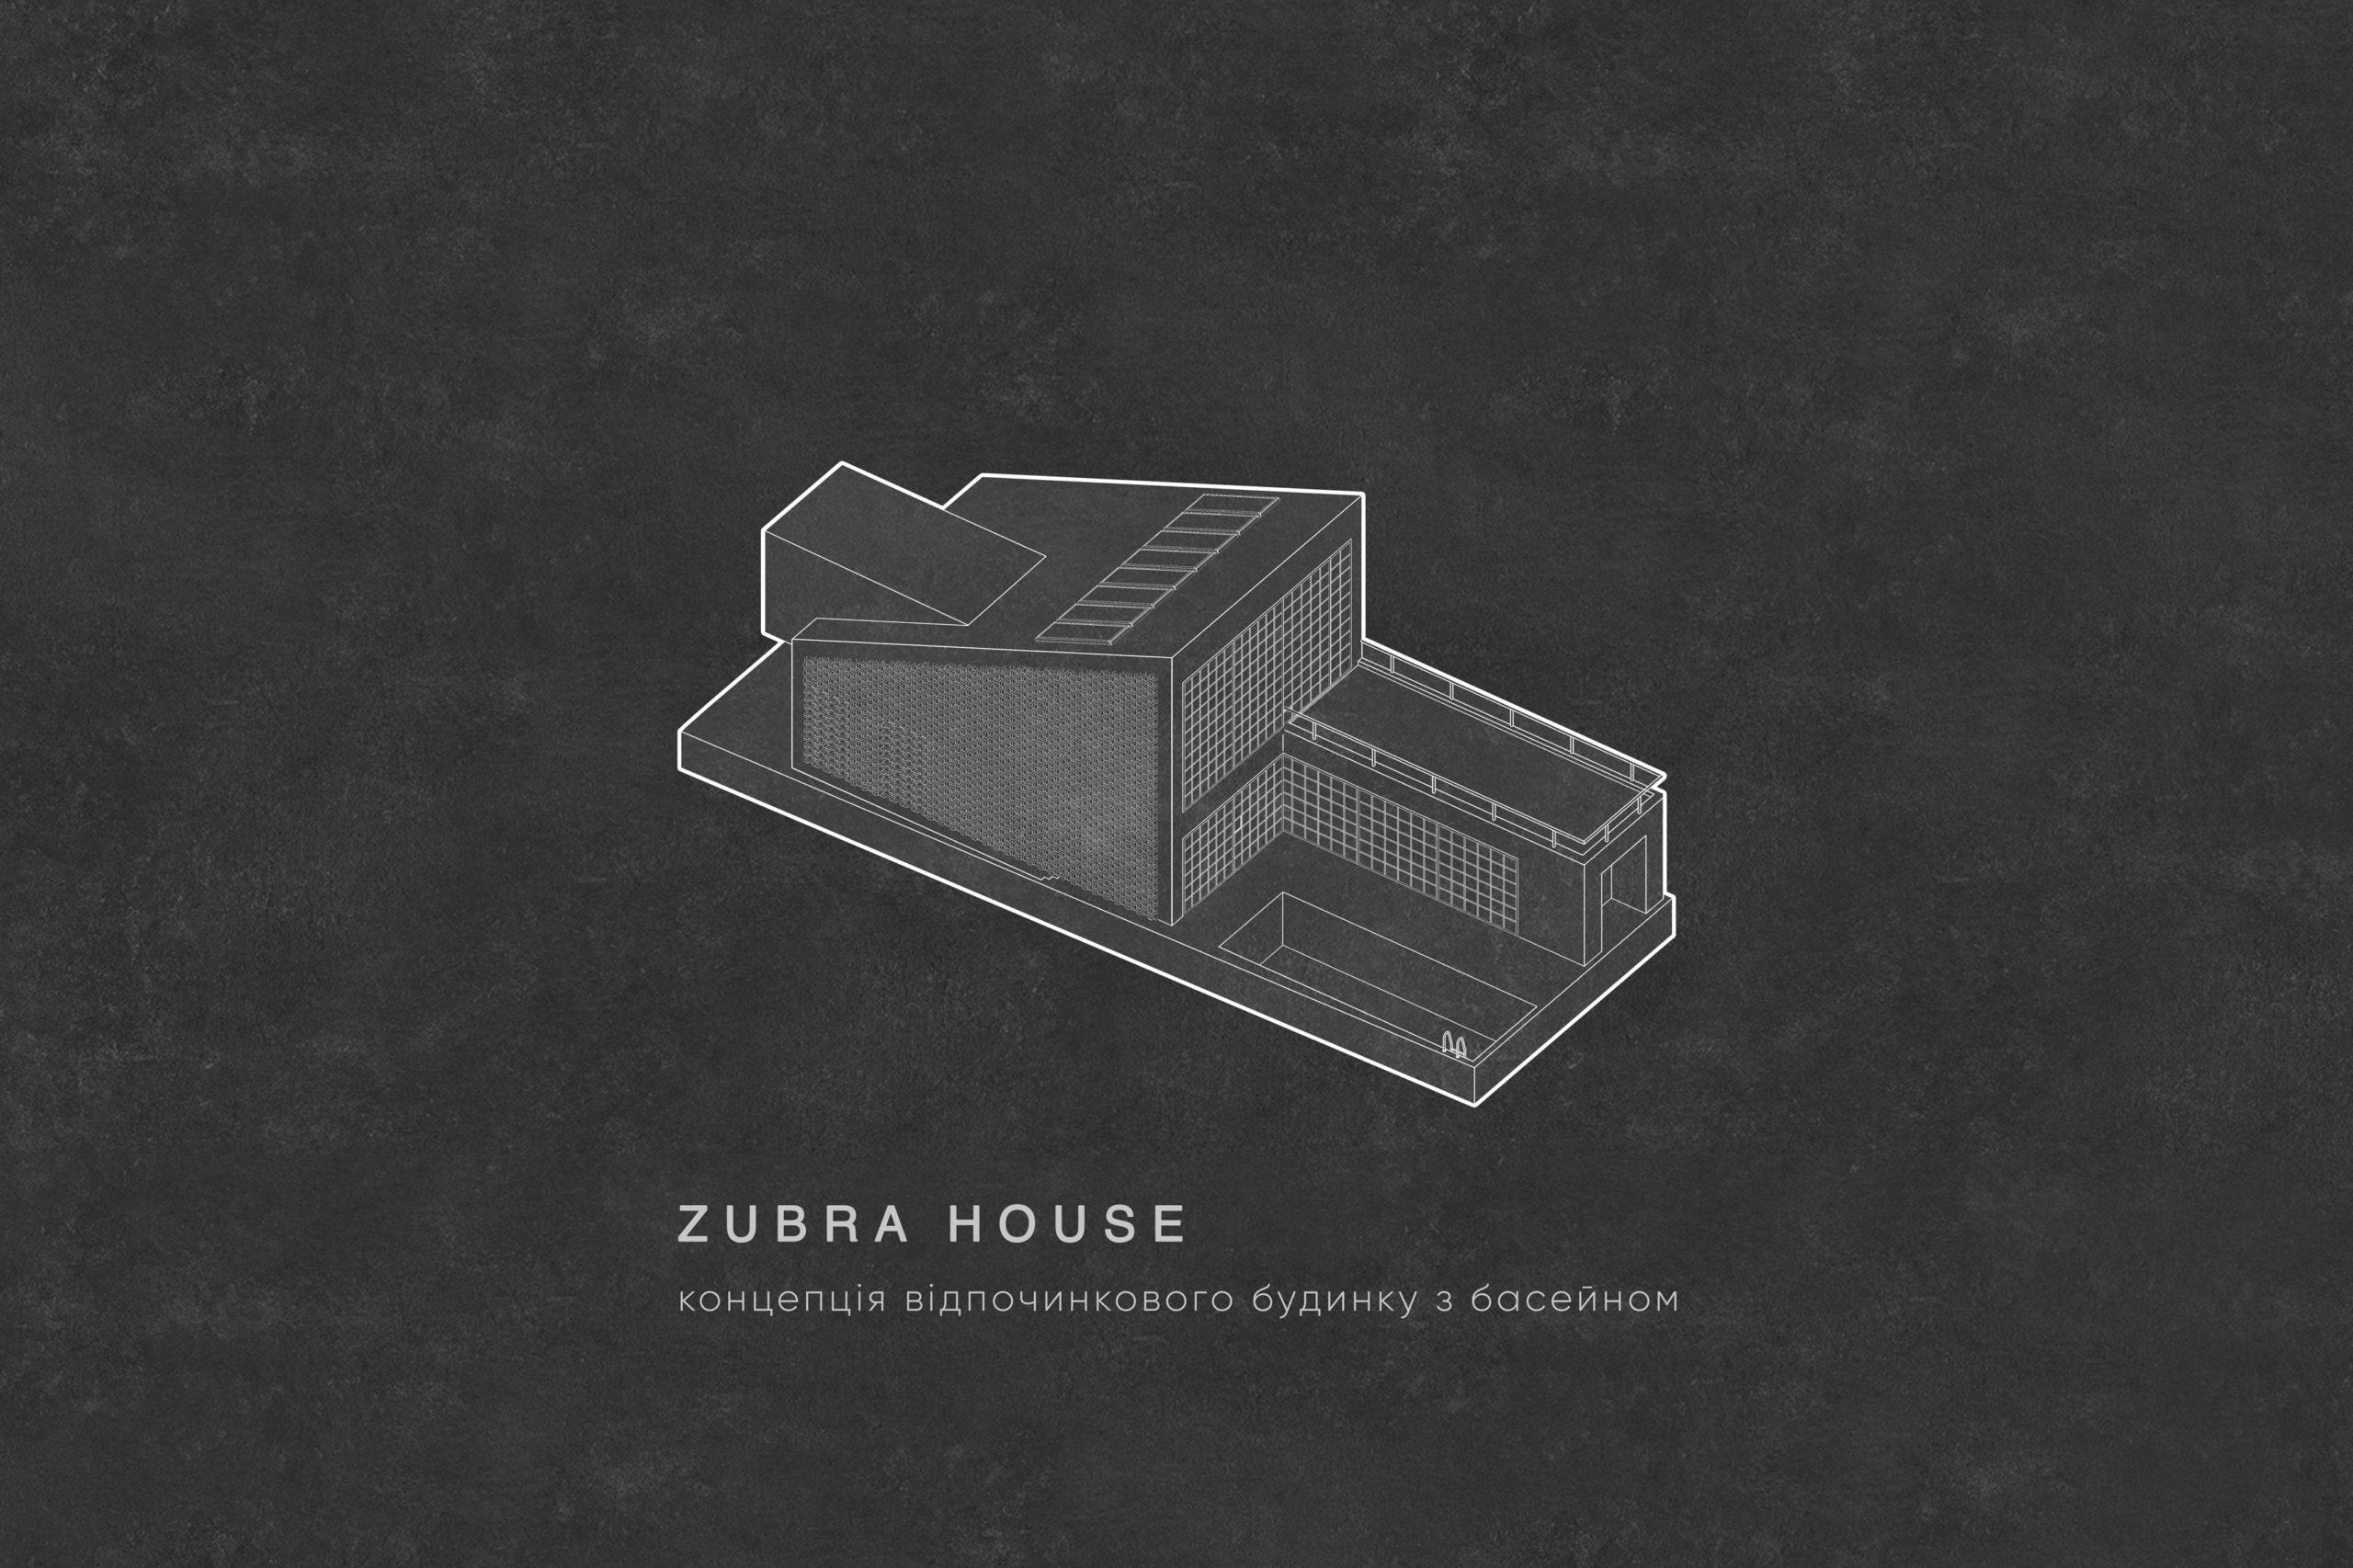 ZUBRA house